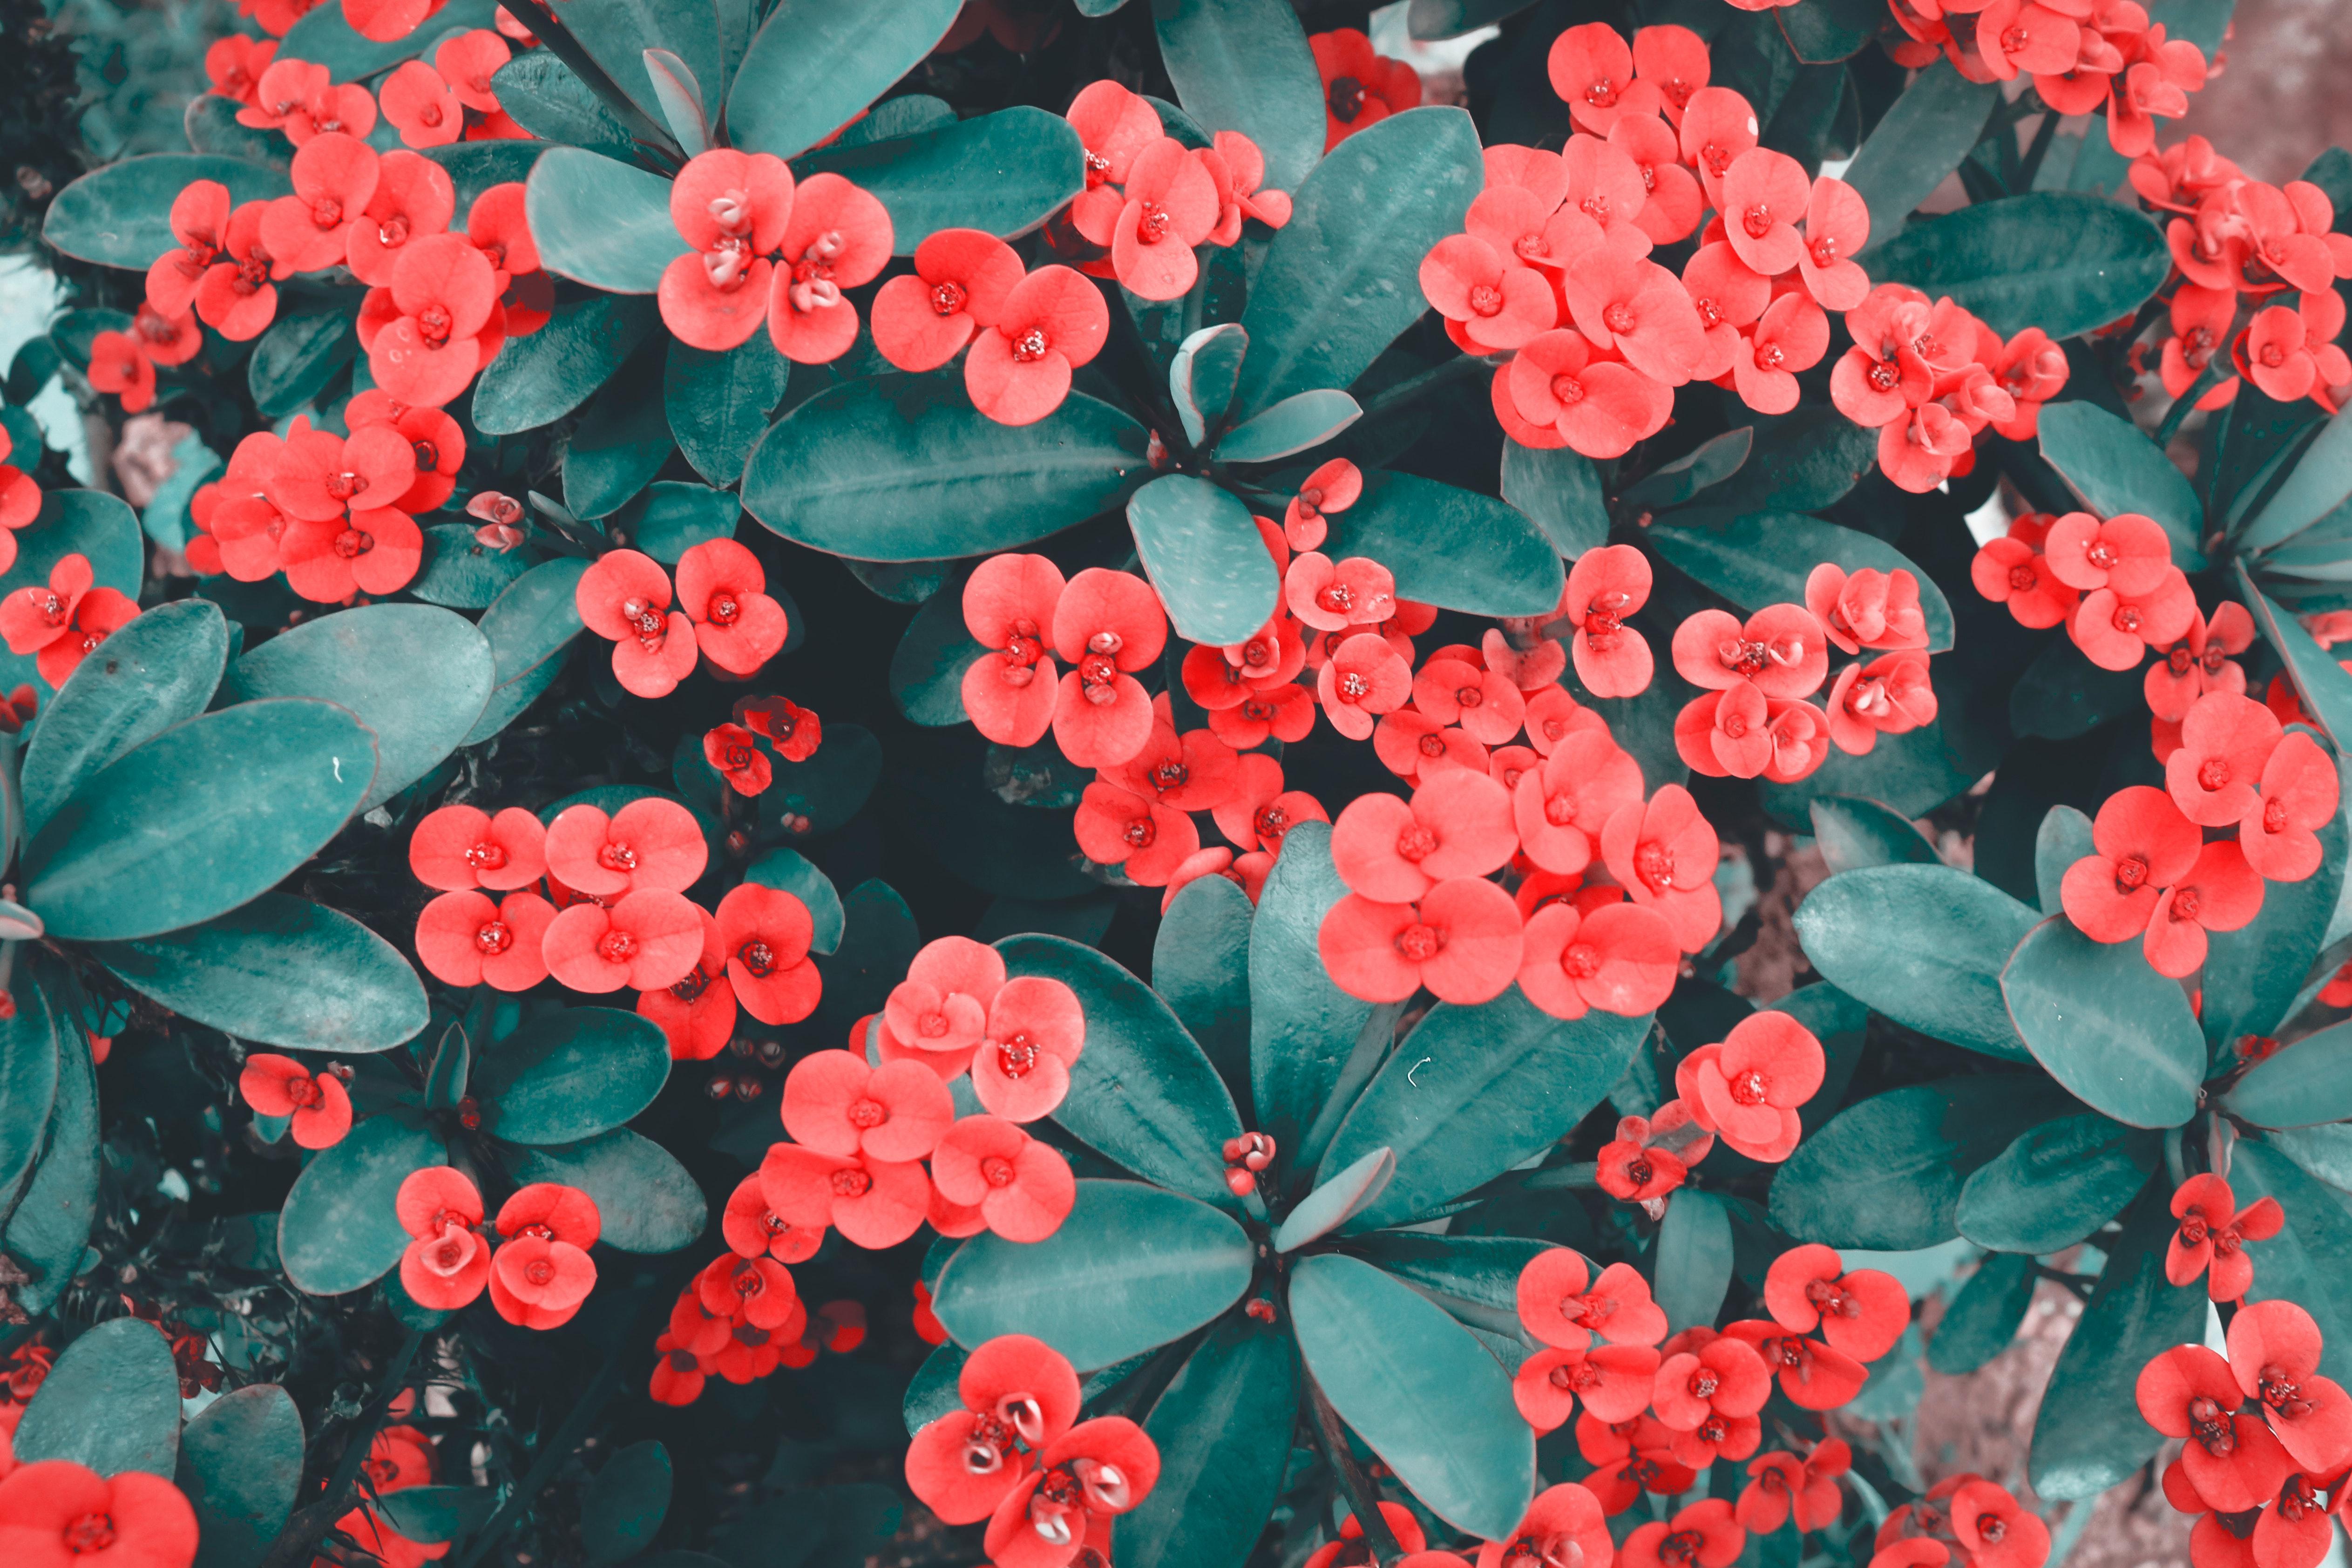 Free Images 4k Wallpaper Beautiful Bloom Blooming